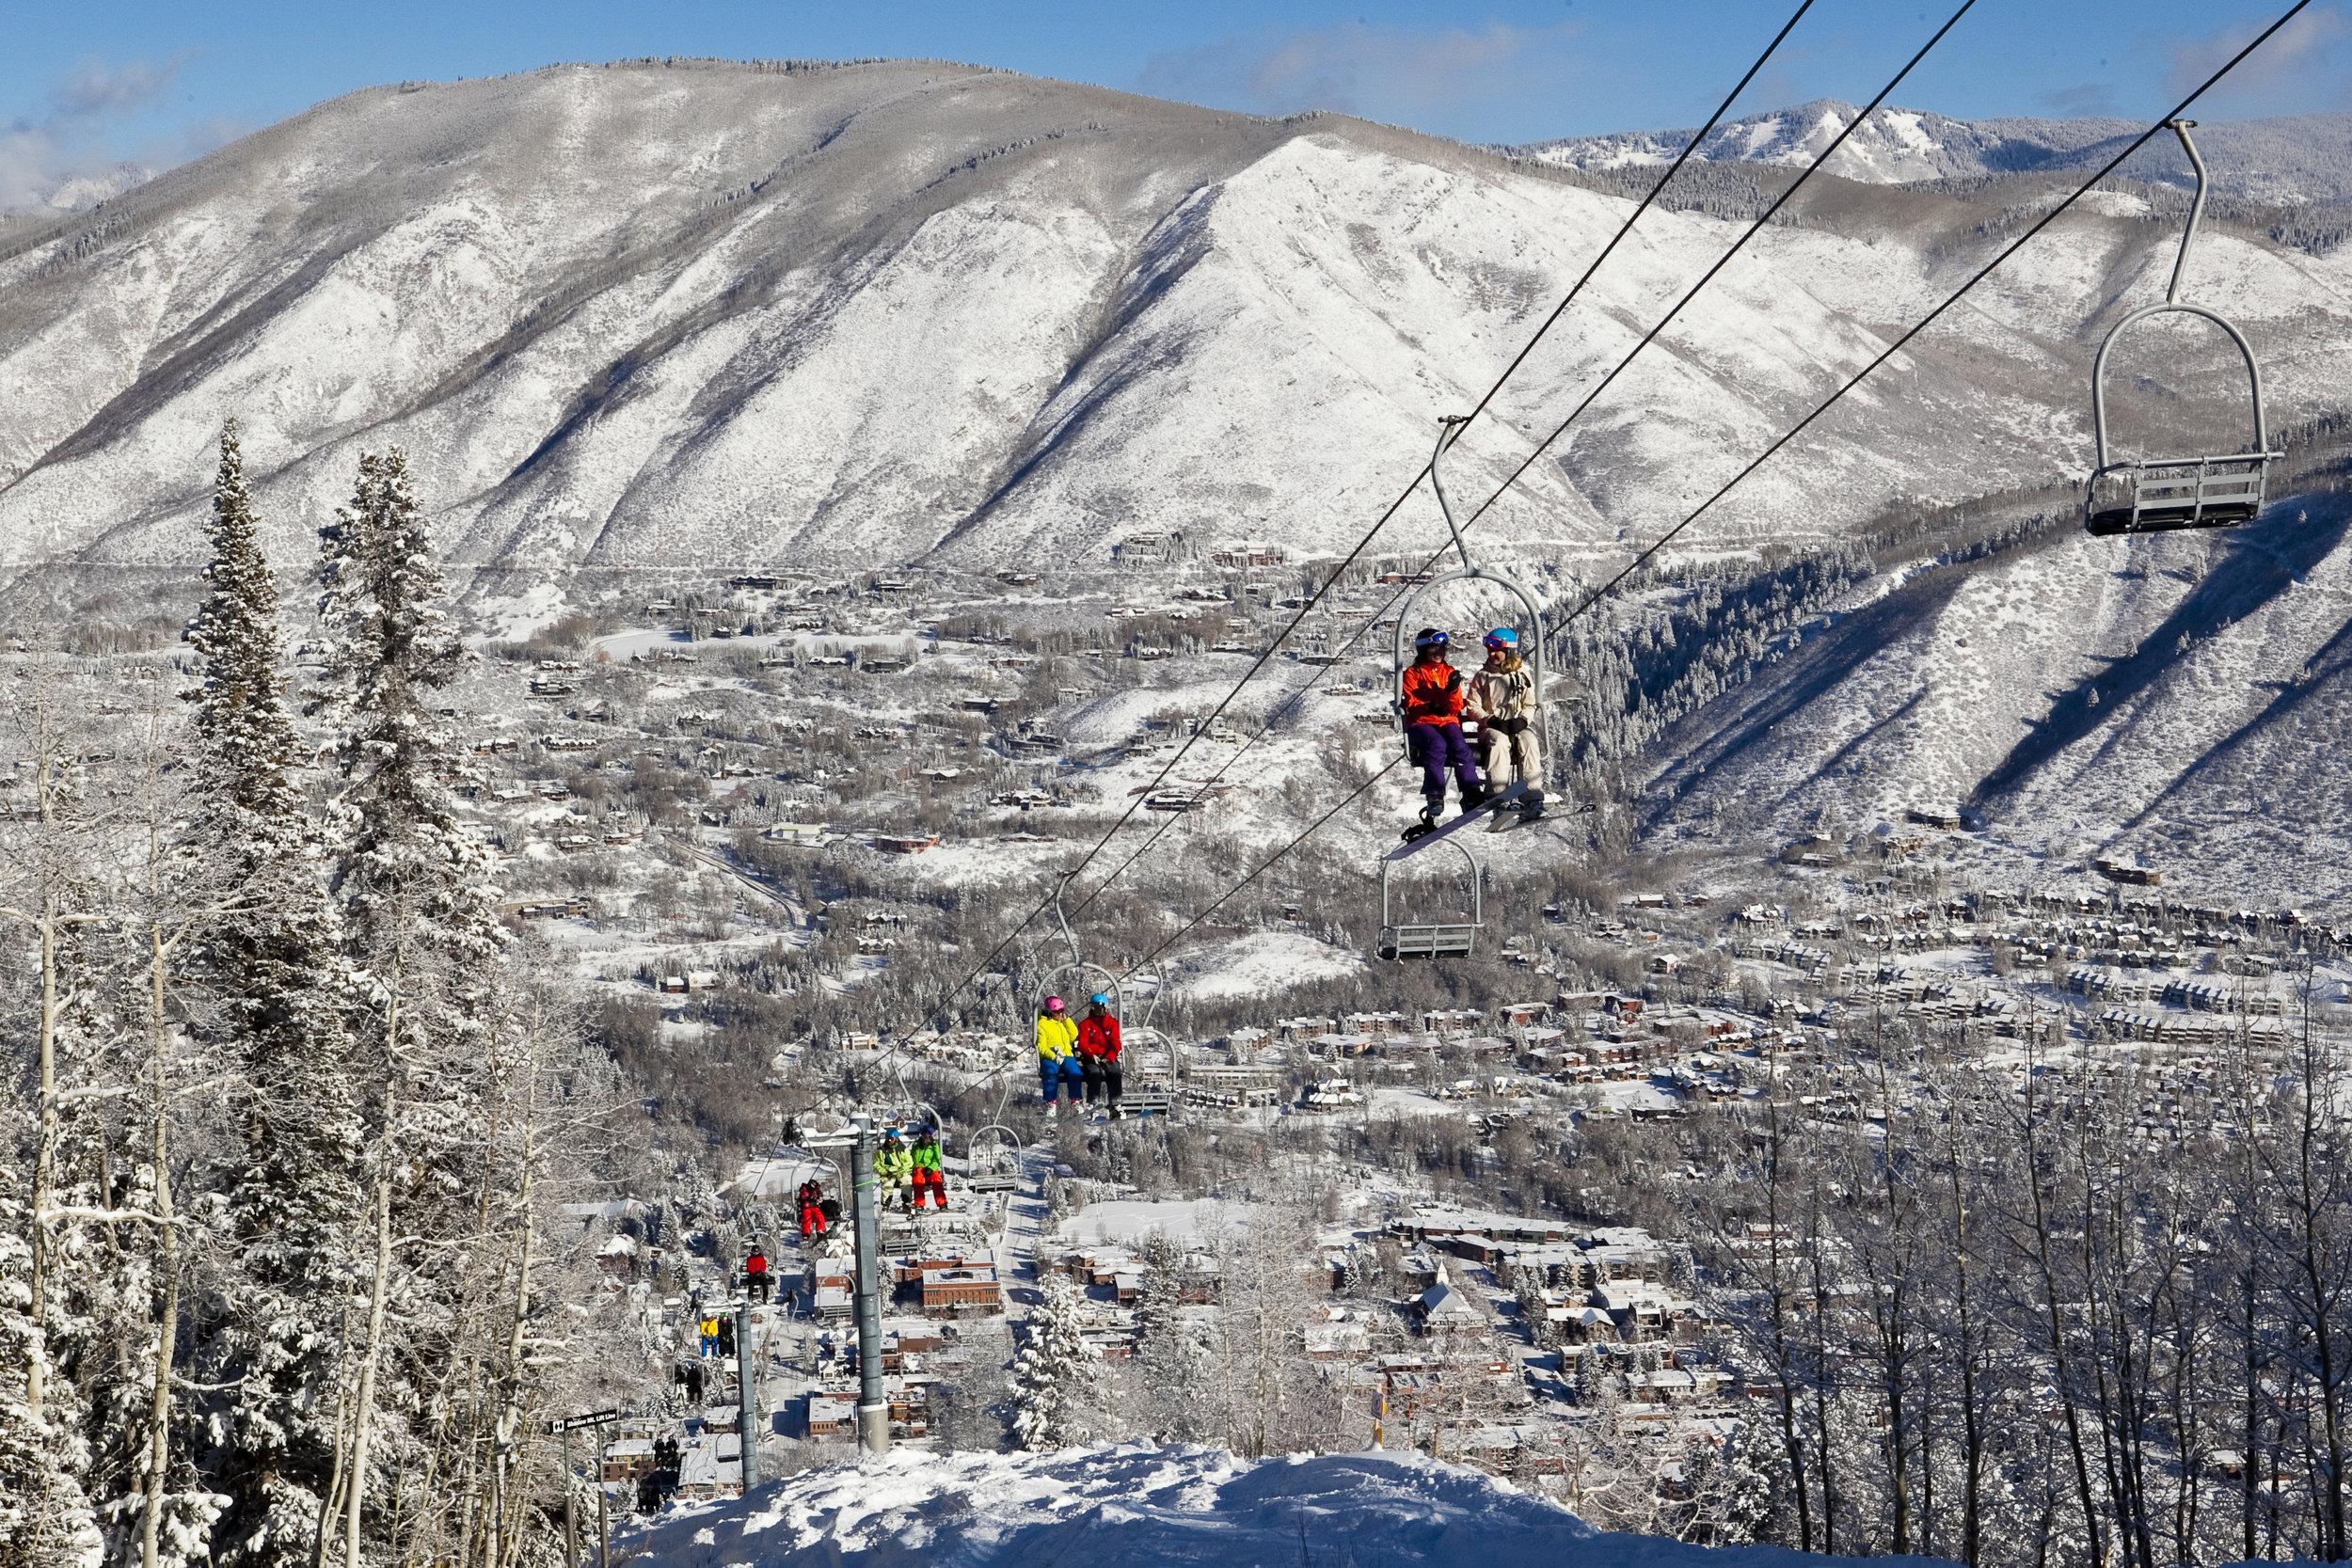 Lift_1A_on_Aspen_Mountain.jpg